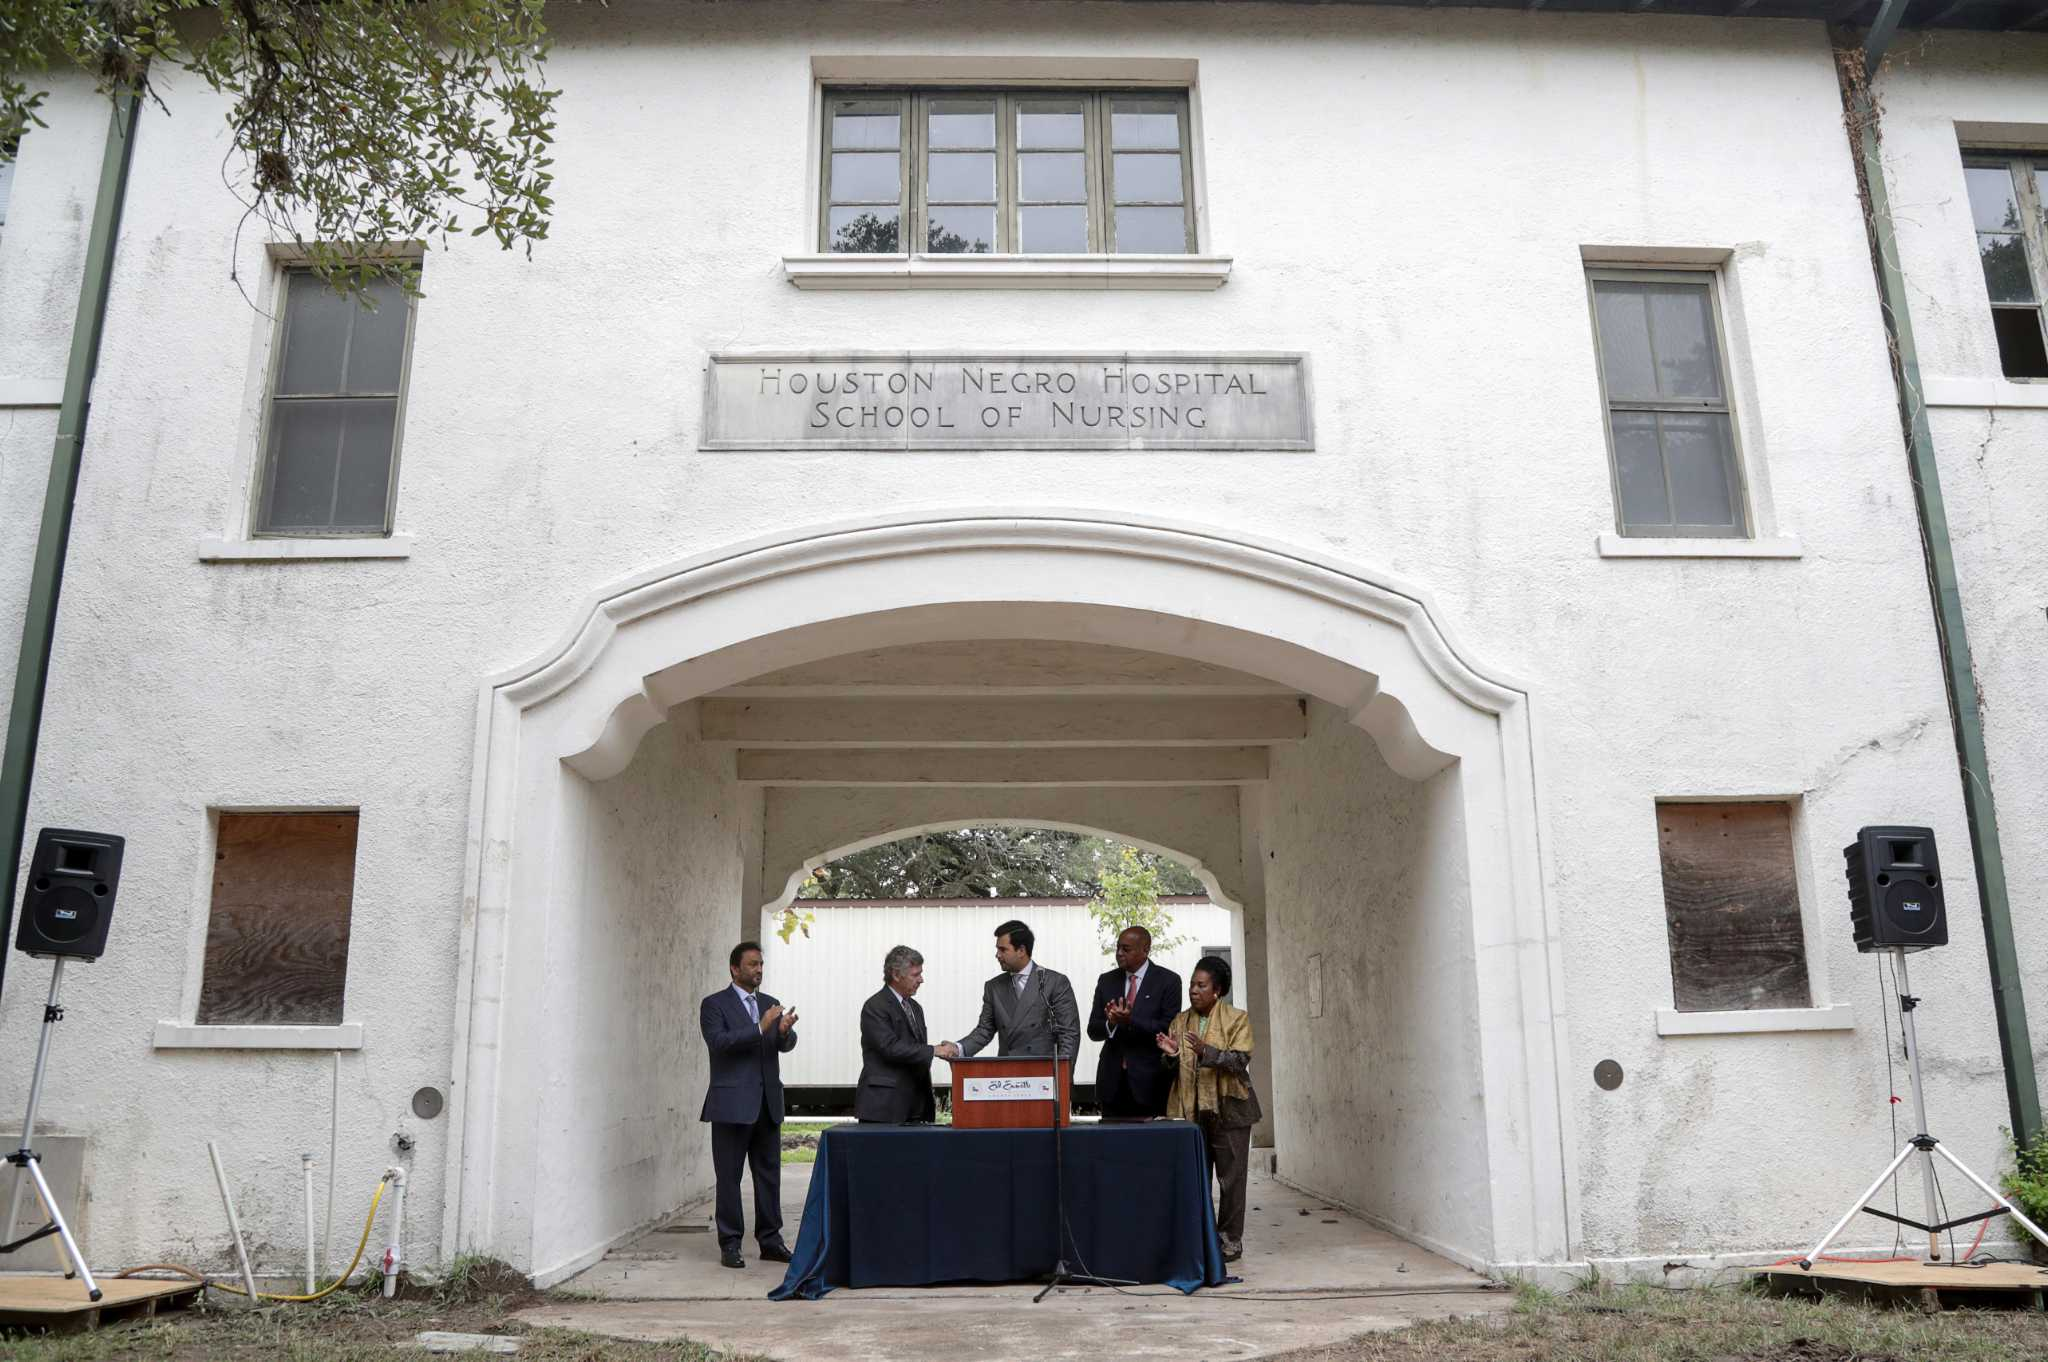 With Qatar's help, Harris County to reopen Third Ward hospital - Houston Chron...